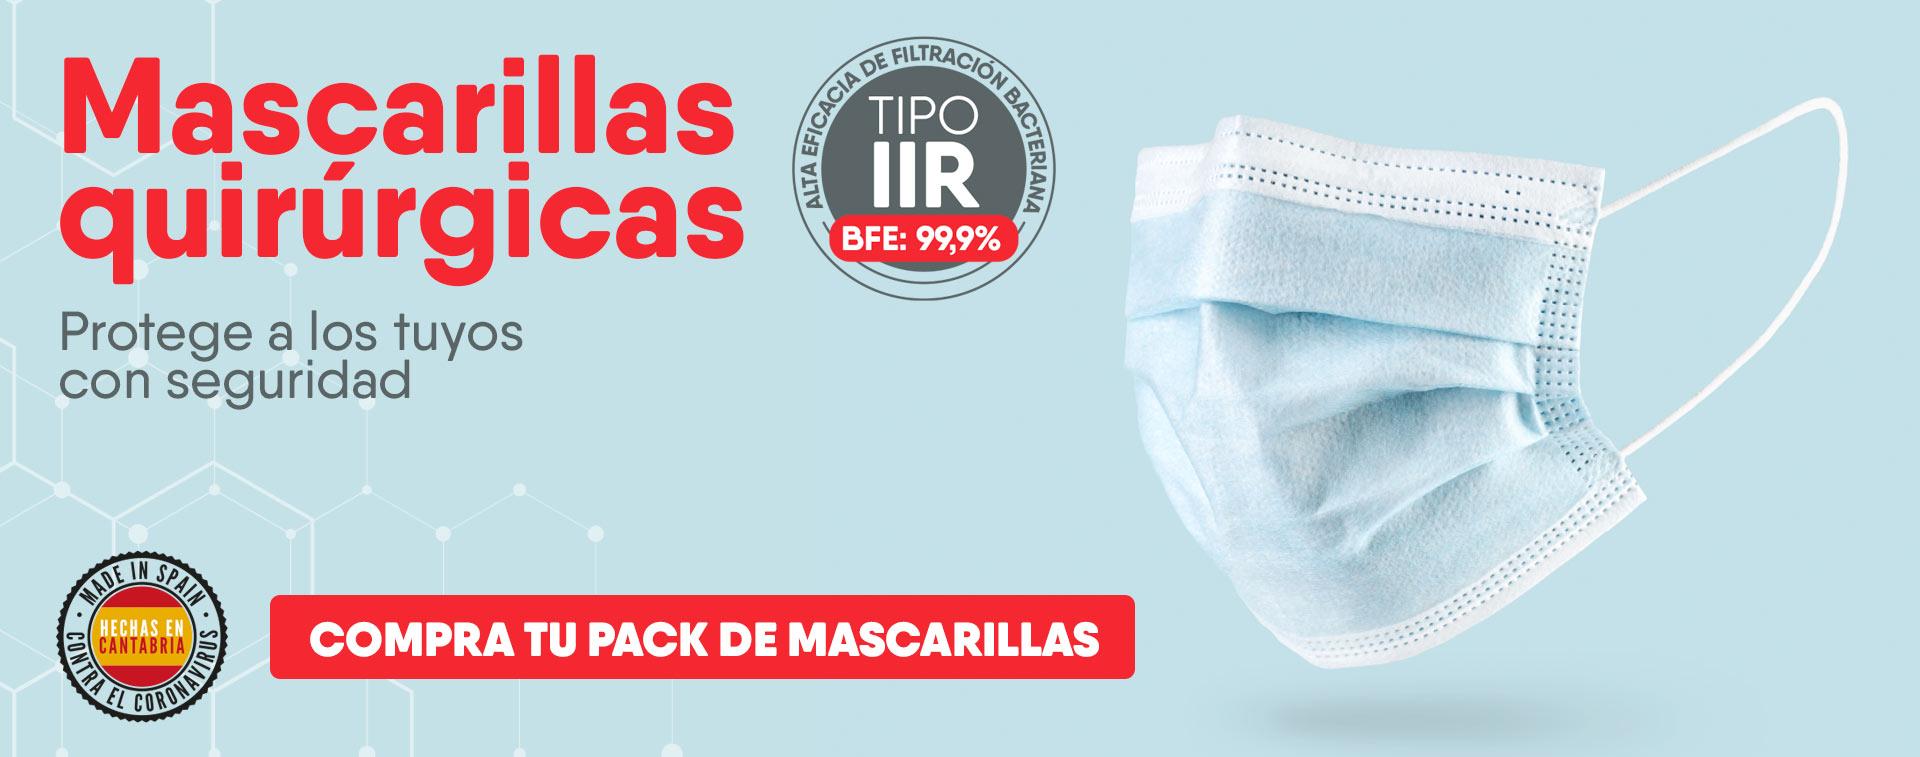 Mascarillas quirurgicas tipo IIR homologadas Amica